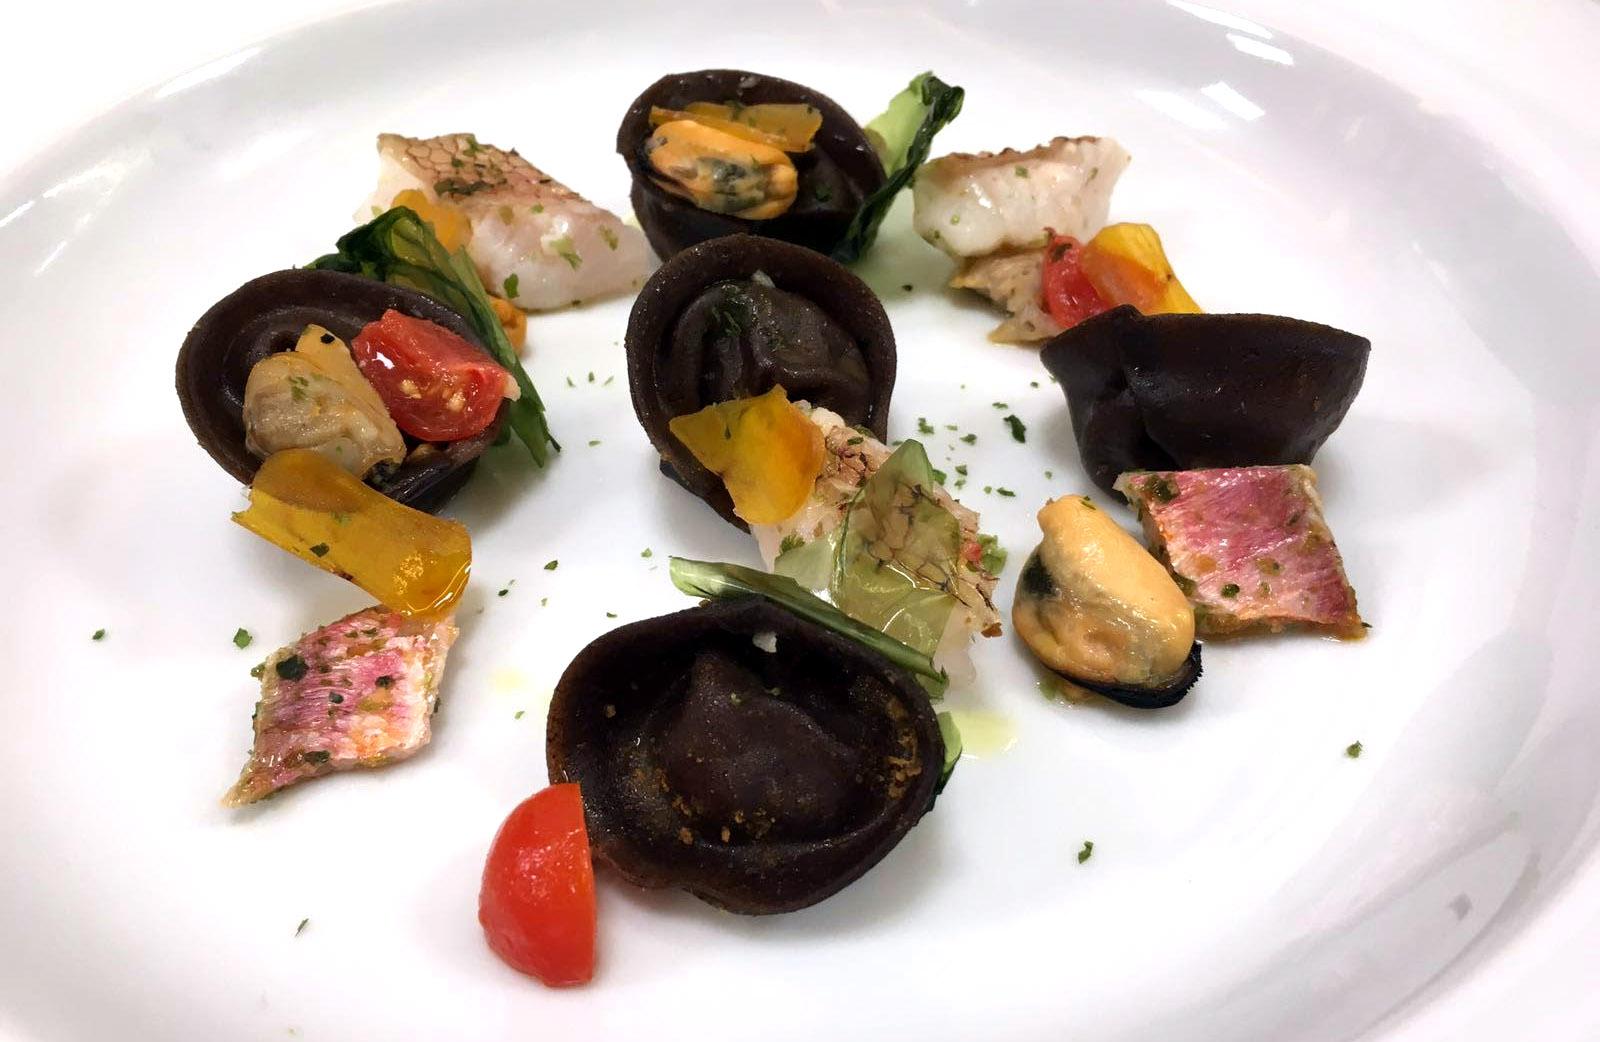 Tortelli di Grano Arso alla Zuppa di Pesce di Fondale e Bottarga di Muggine e Ostrica Ghiacciata